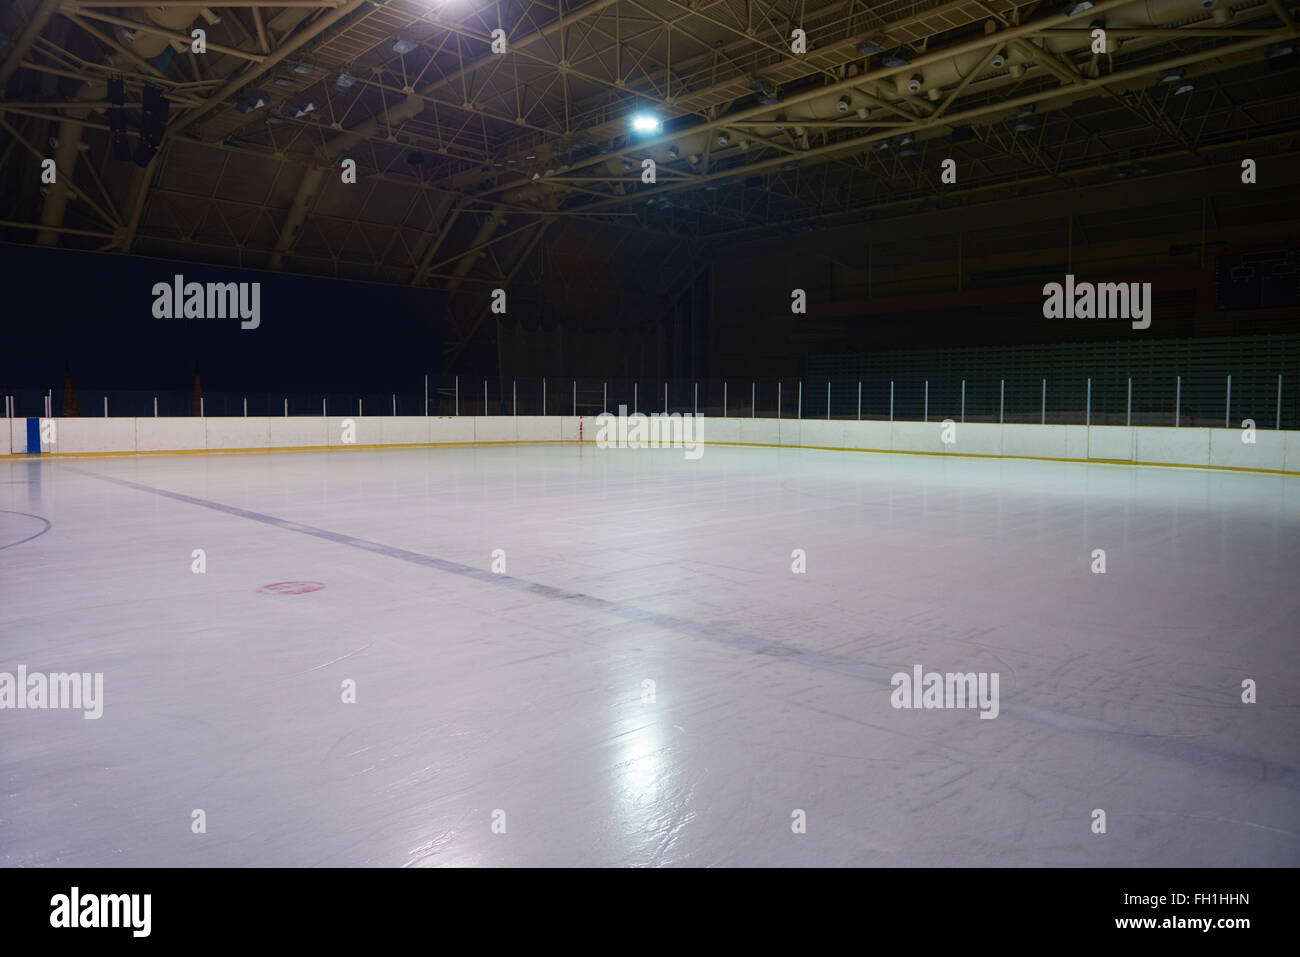 hight resolution of empty ice rink hockey arena stock image